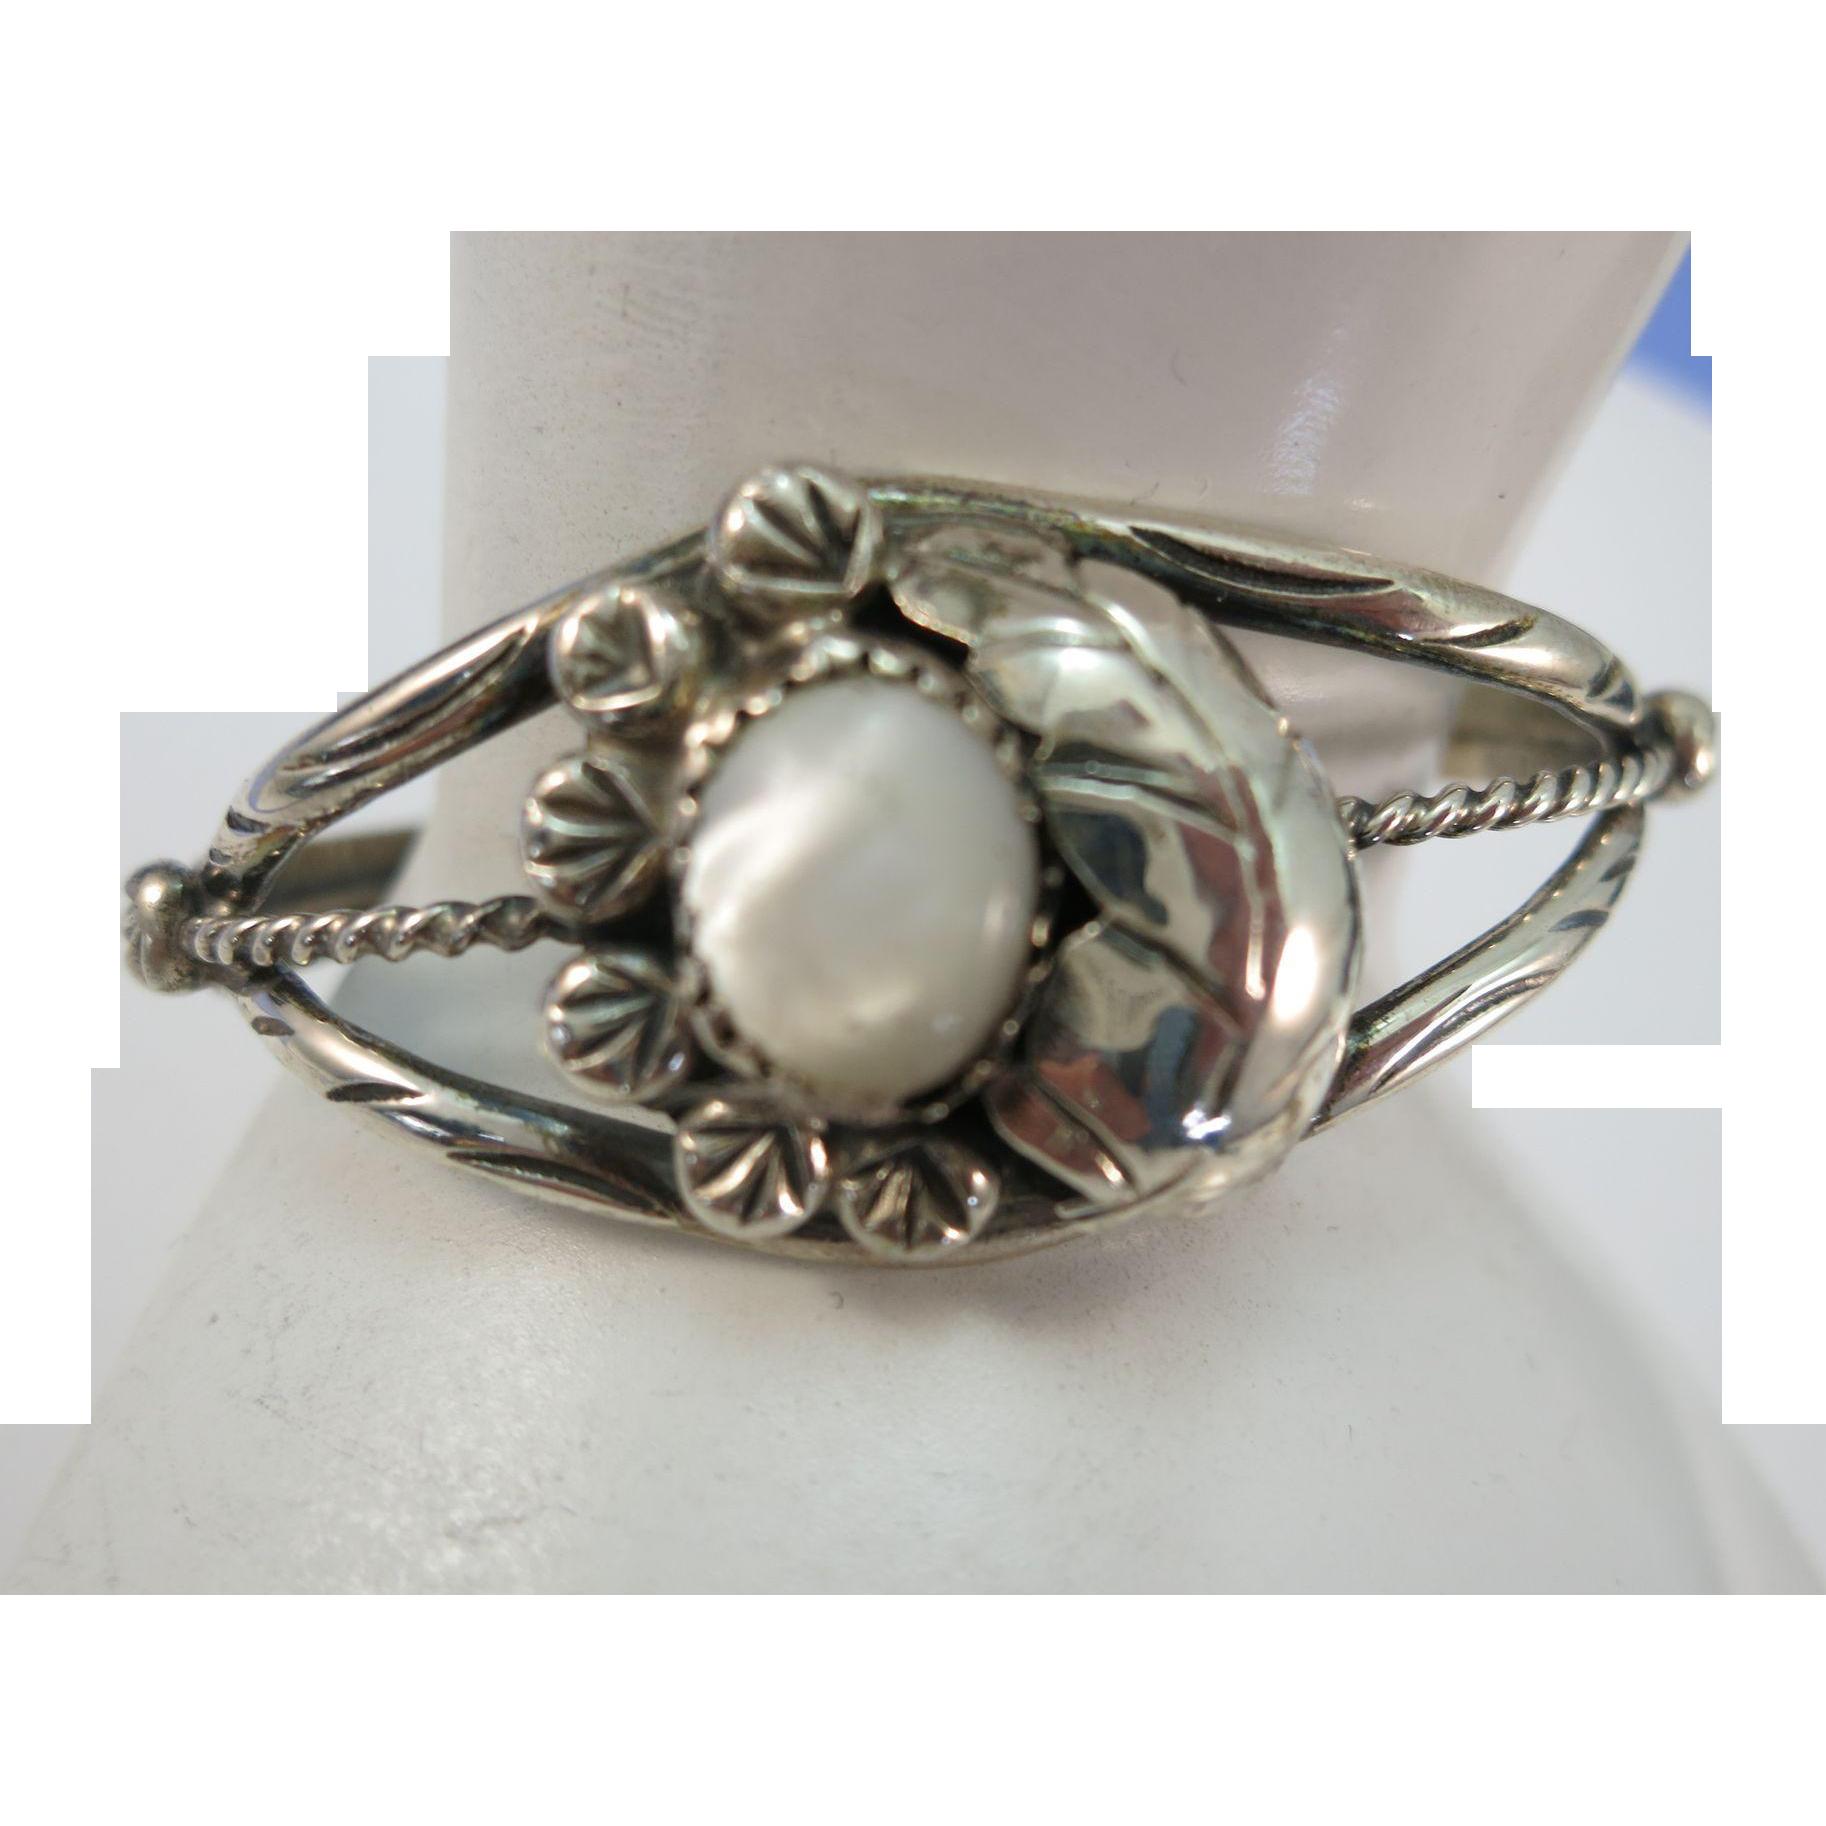 VINTAGE Mother of Pearl and Sterling Charming Bracelet